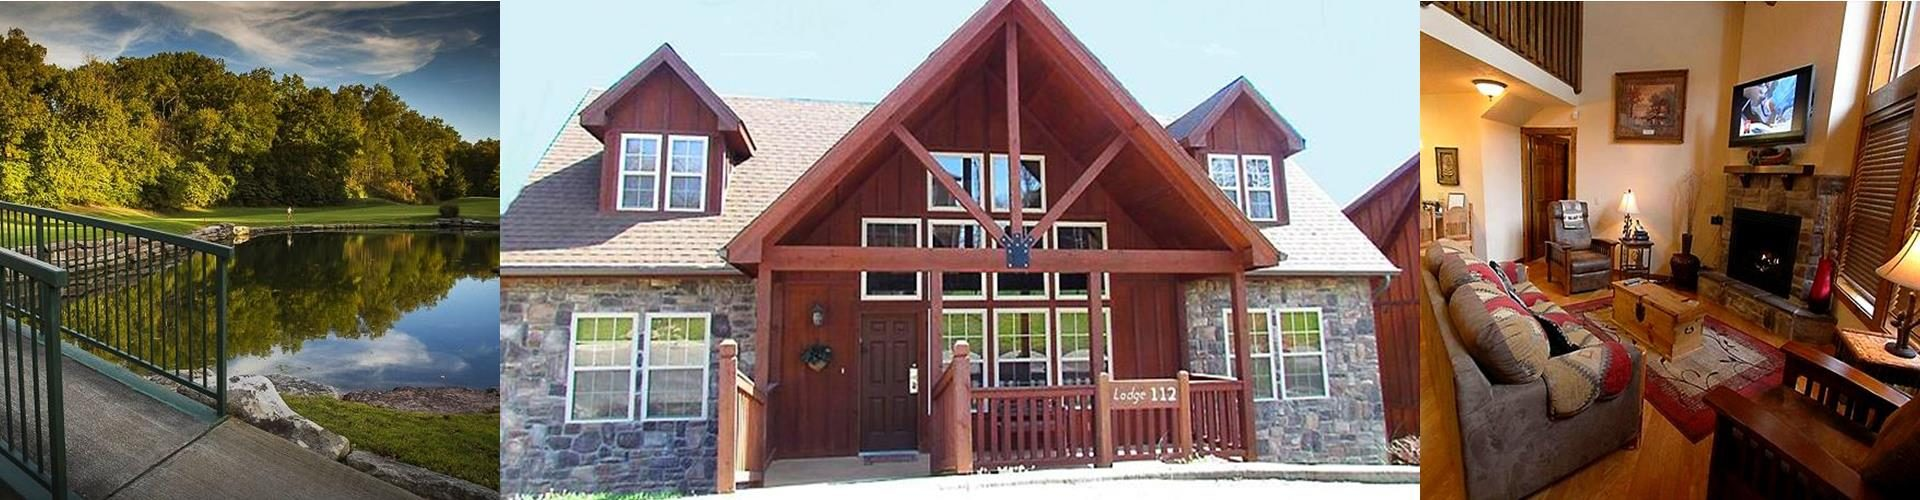 Wilderness Lodge 4 Bedroom Cabin At Stonebridge Branson Mo The Travel Office